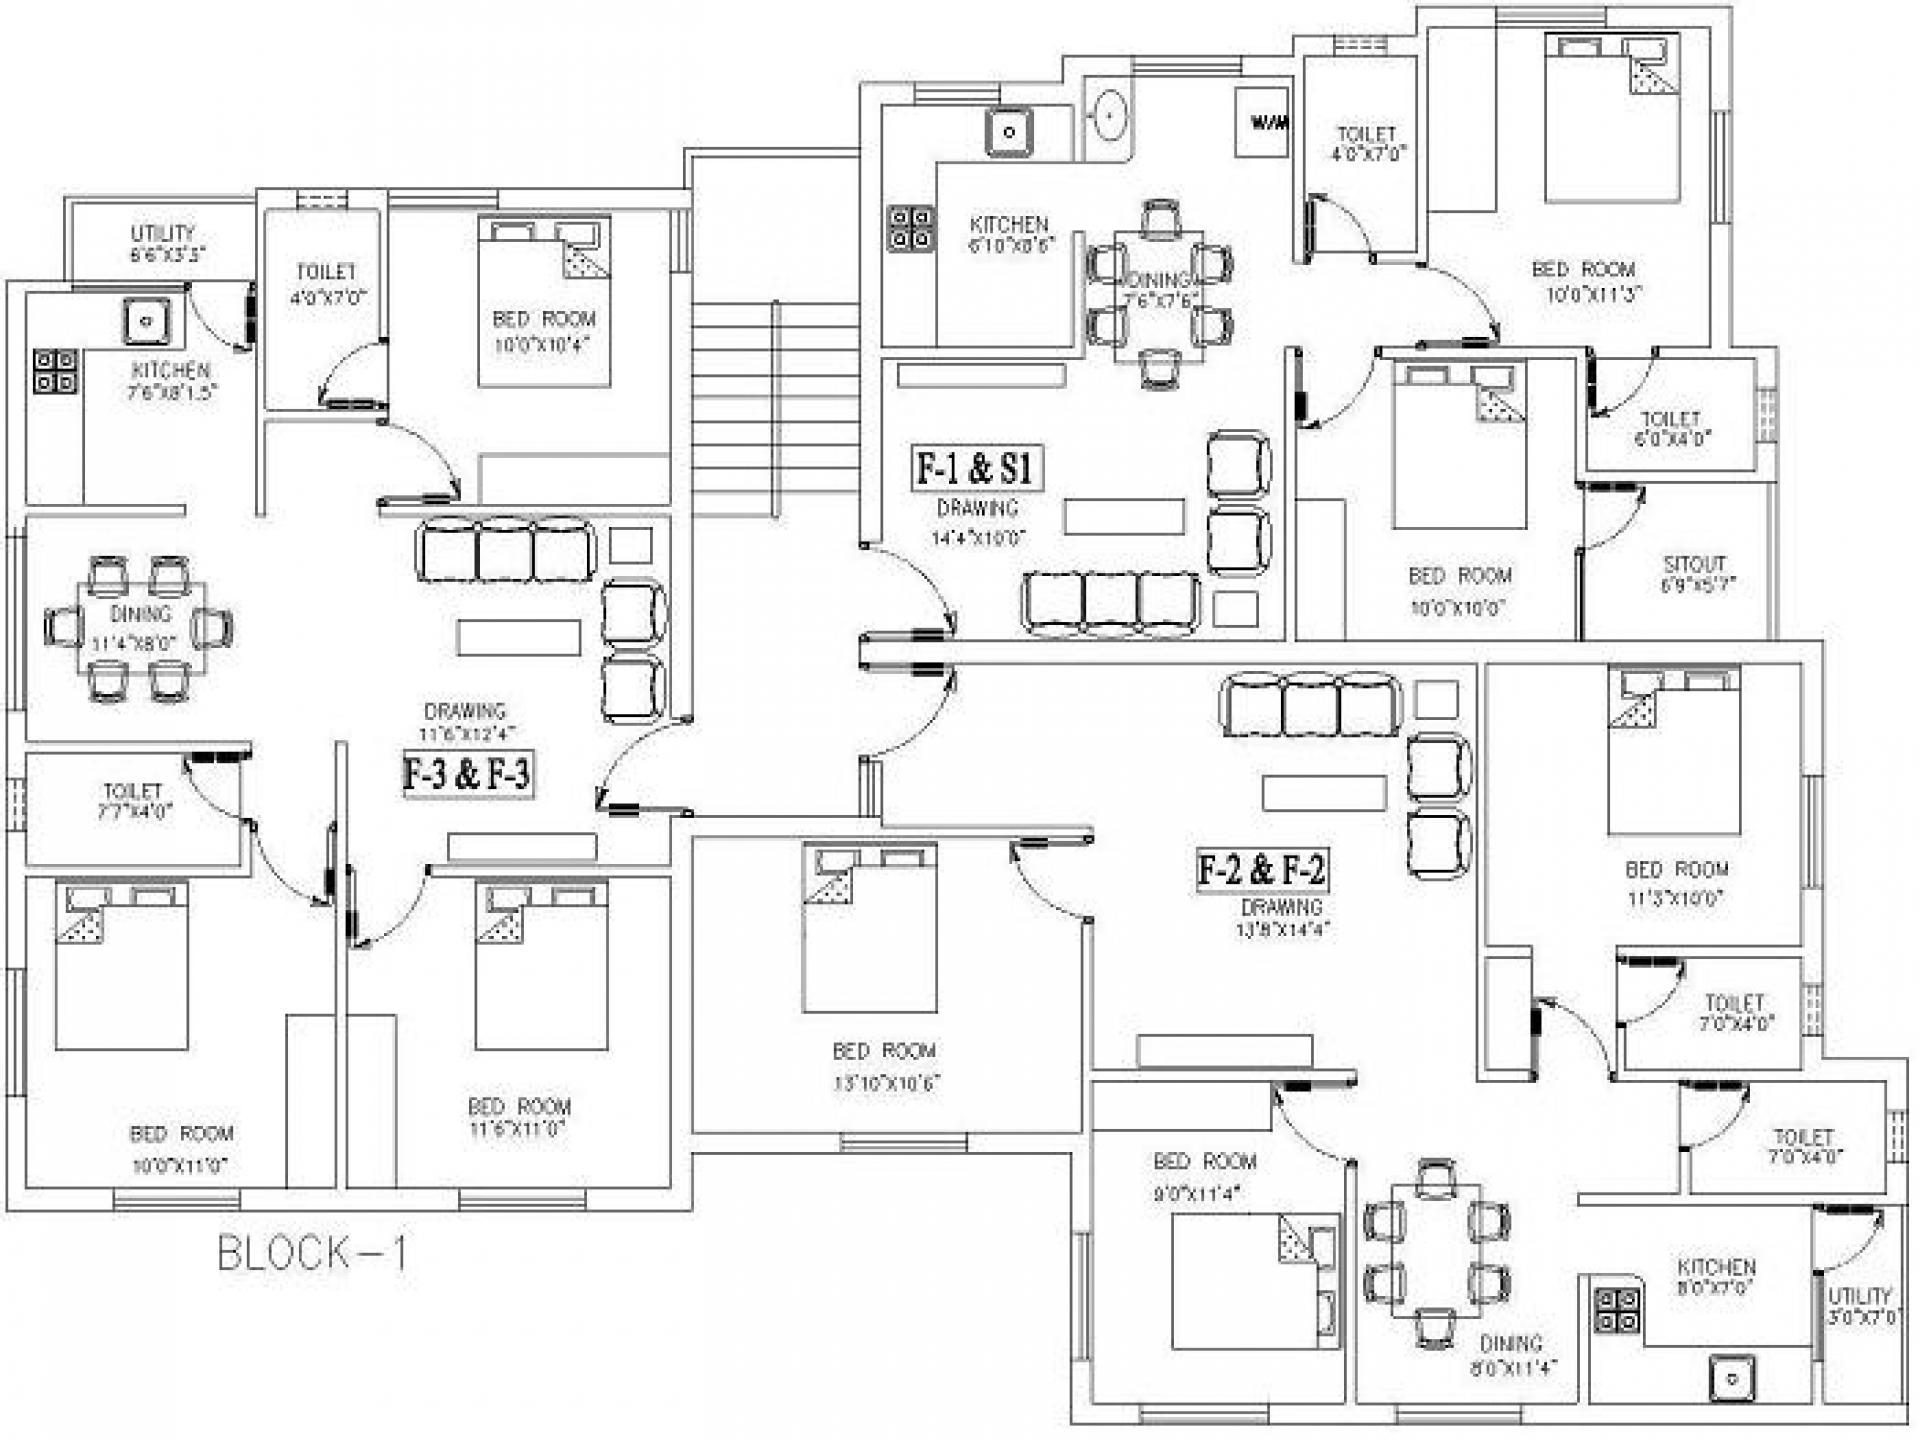 Drawn bedroom sketch plan Beautiful Design Drawing Design House